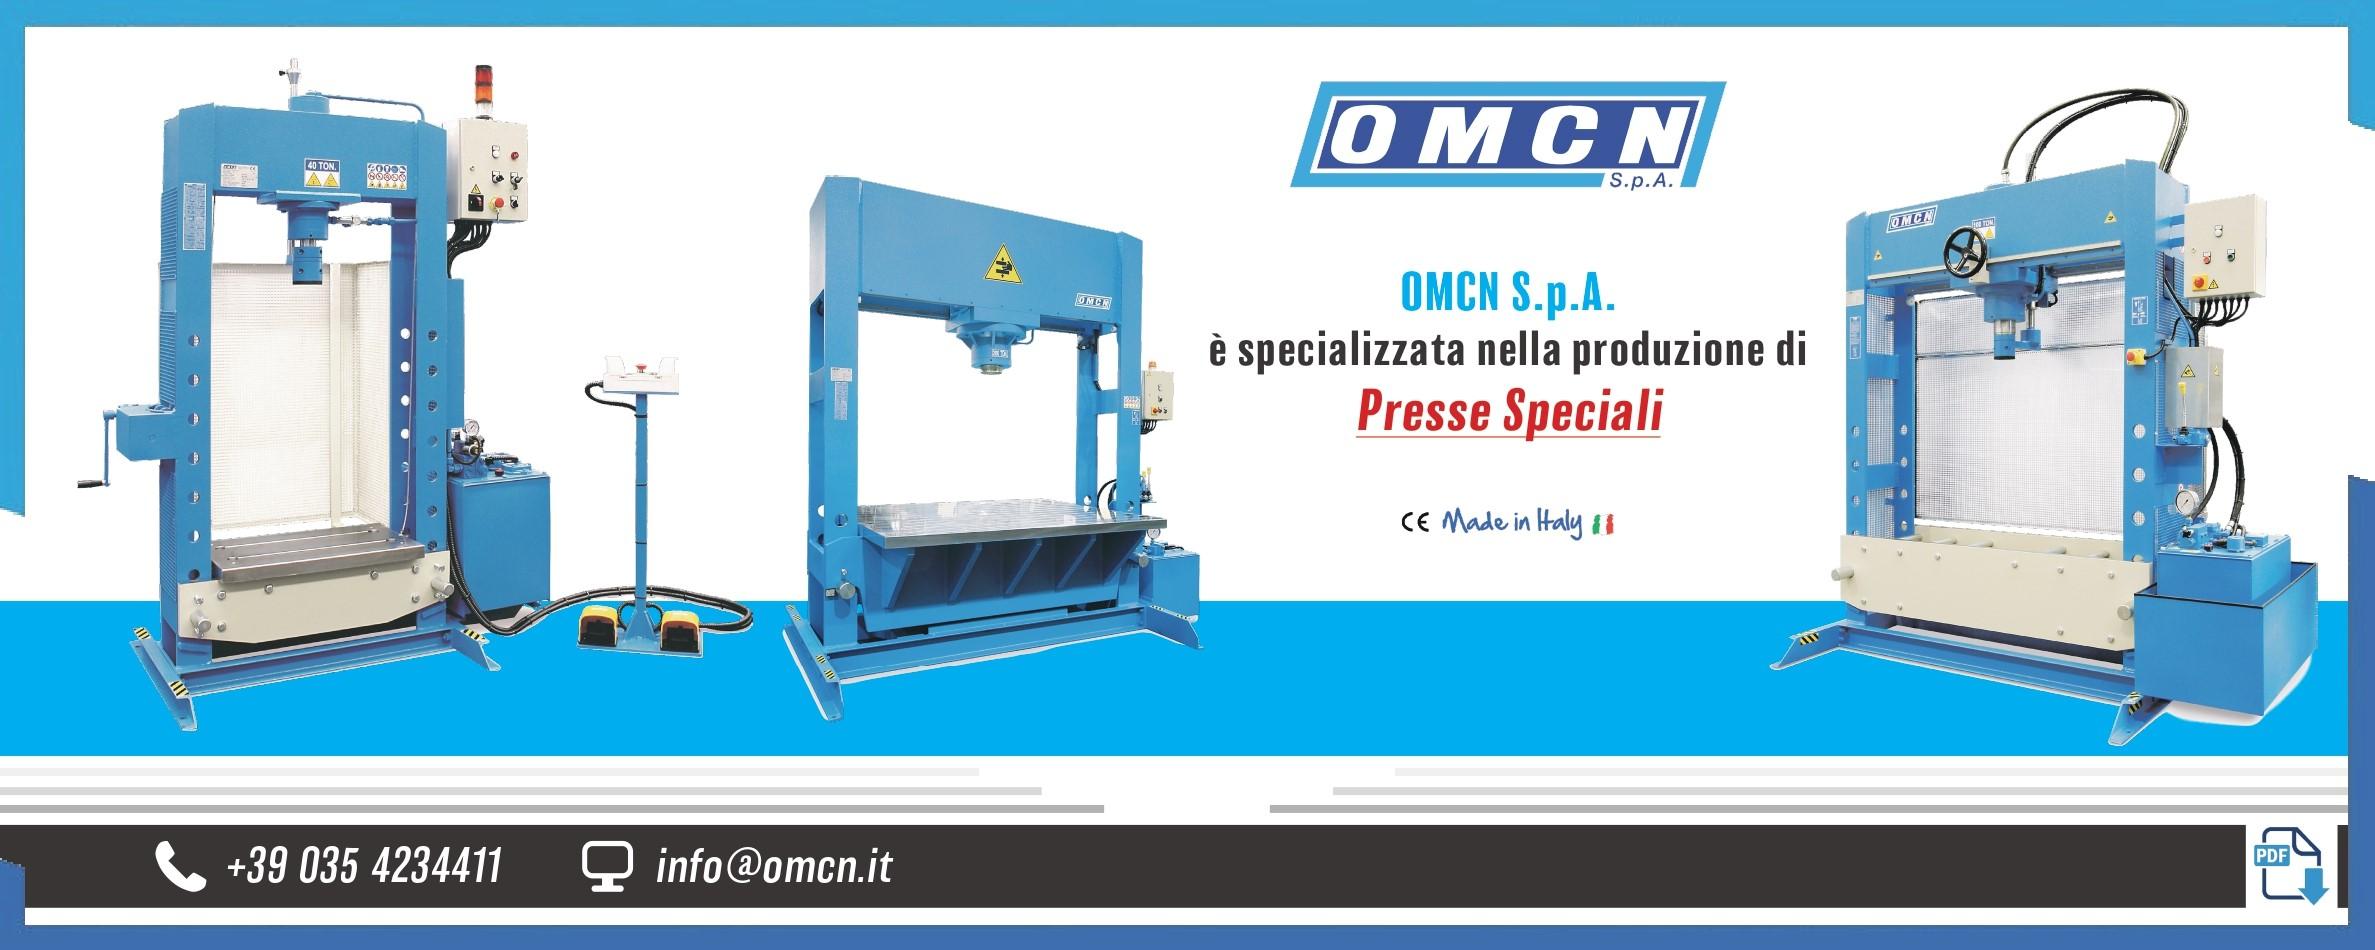 Presse Speciali OMCN